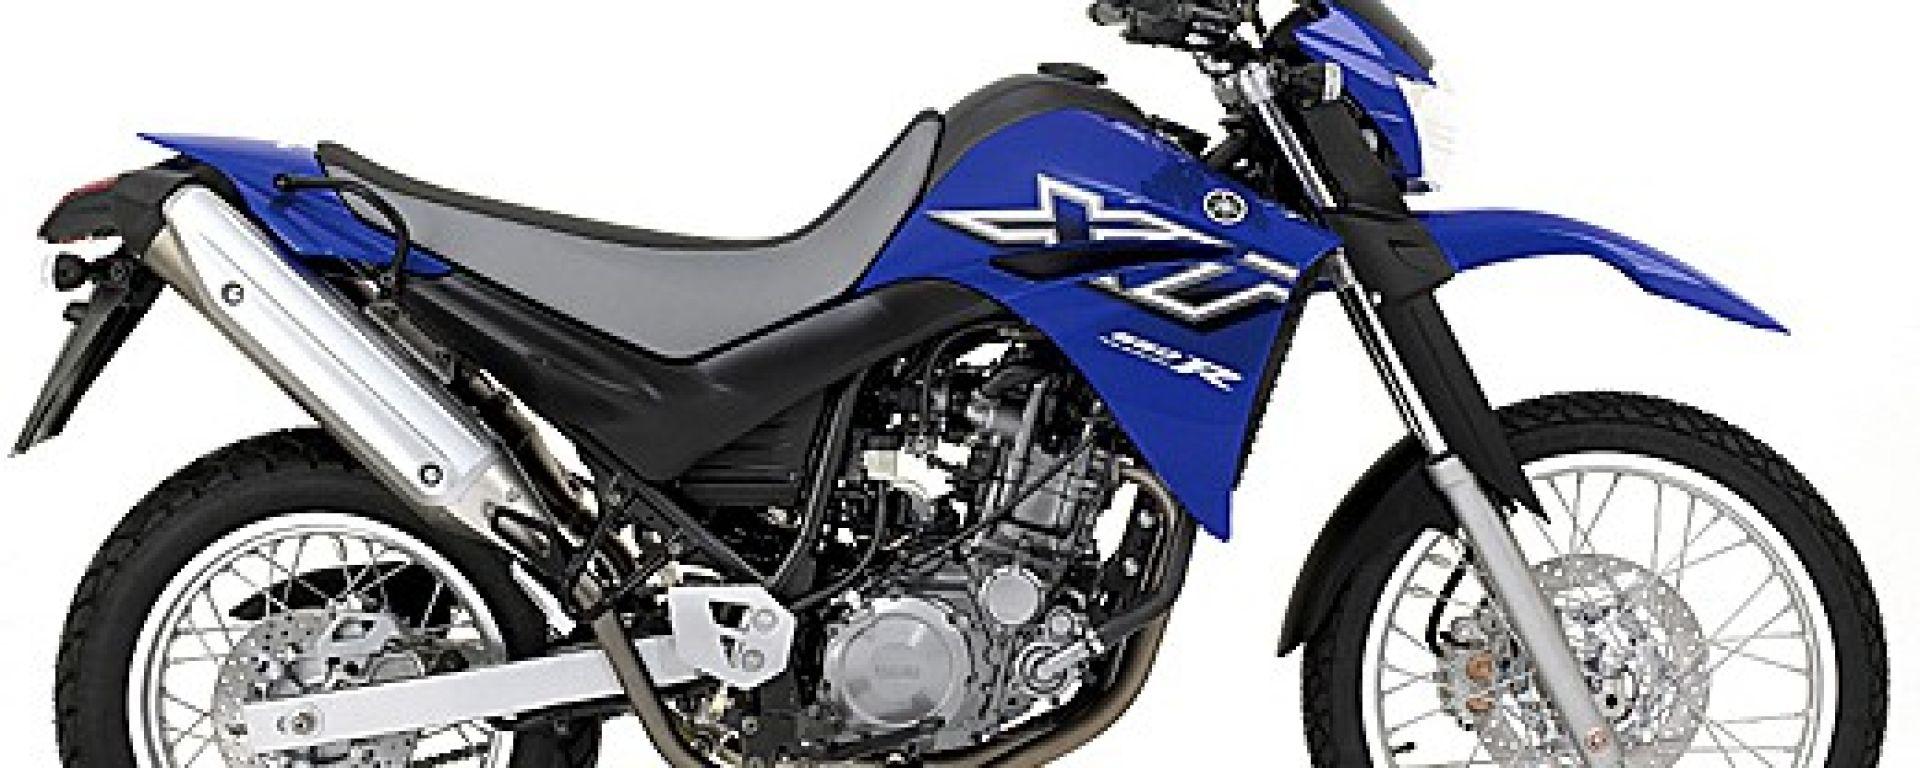 nuova yamaha xt 2017 idea di immagine del motociclo. Black Bedroom Furniture Sets. Home Design Ideas